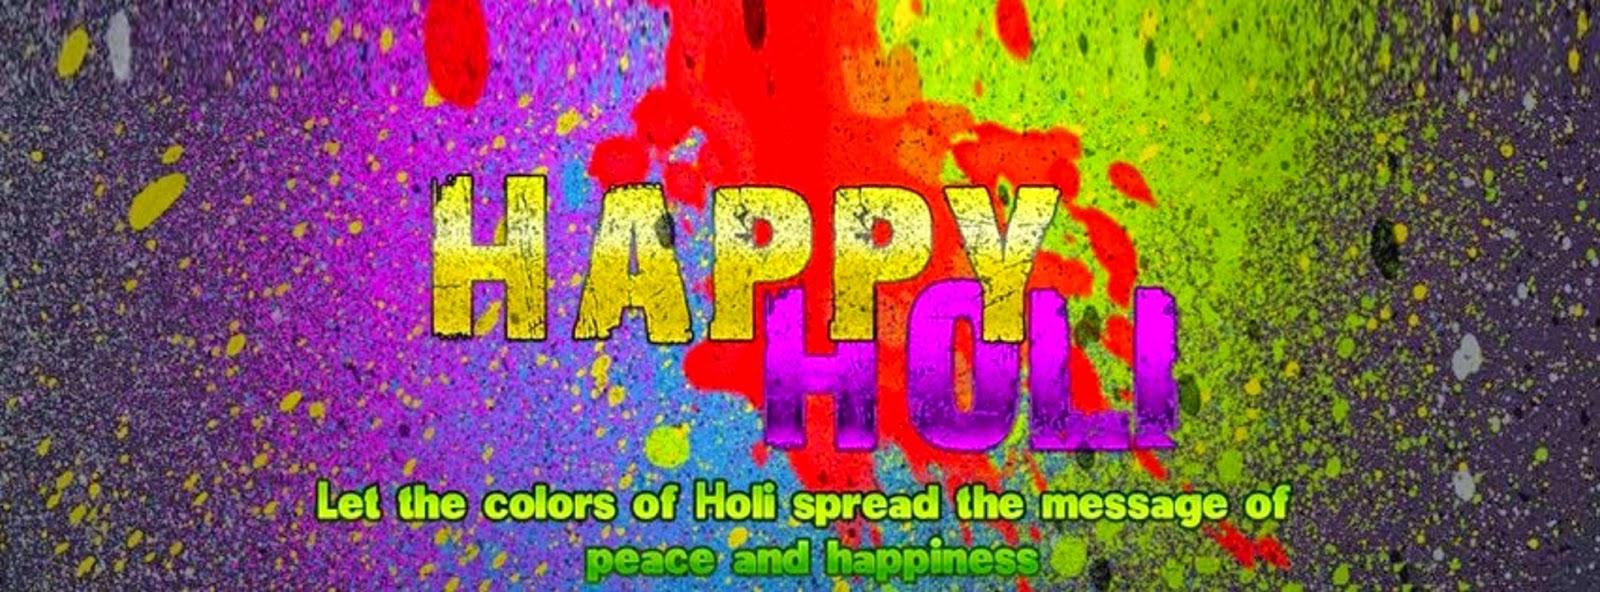 3d wallpaper happy holi for facebook covers hd wallpaper